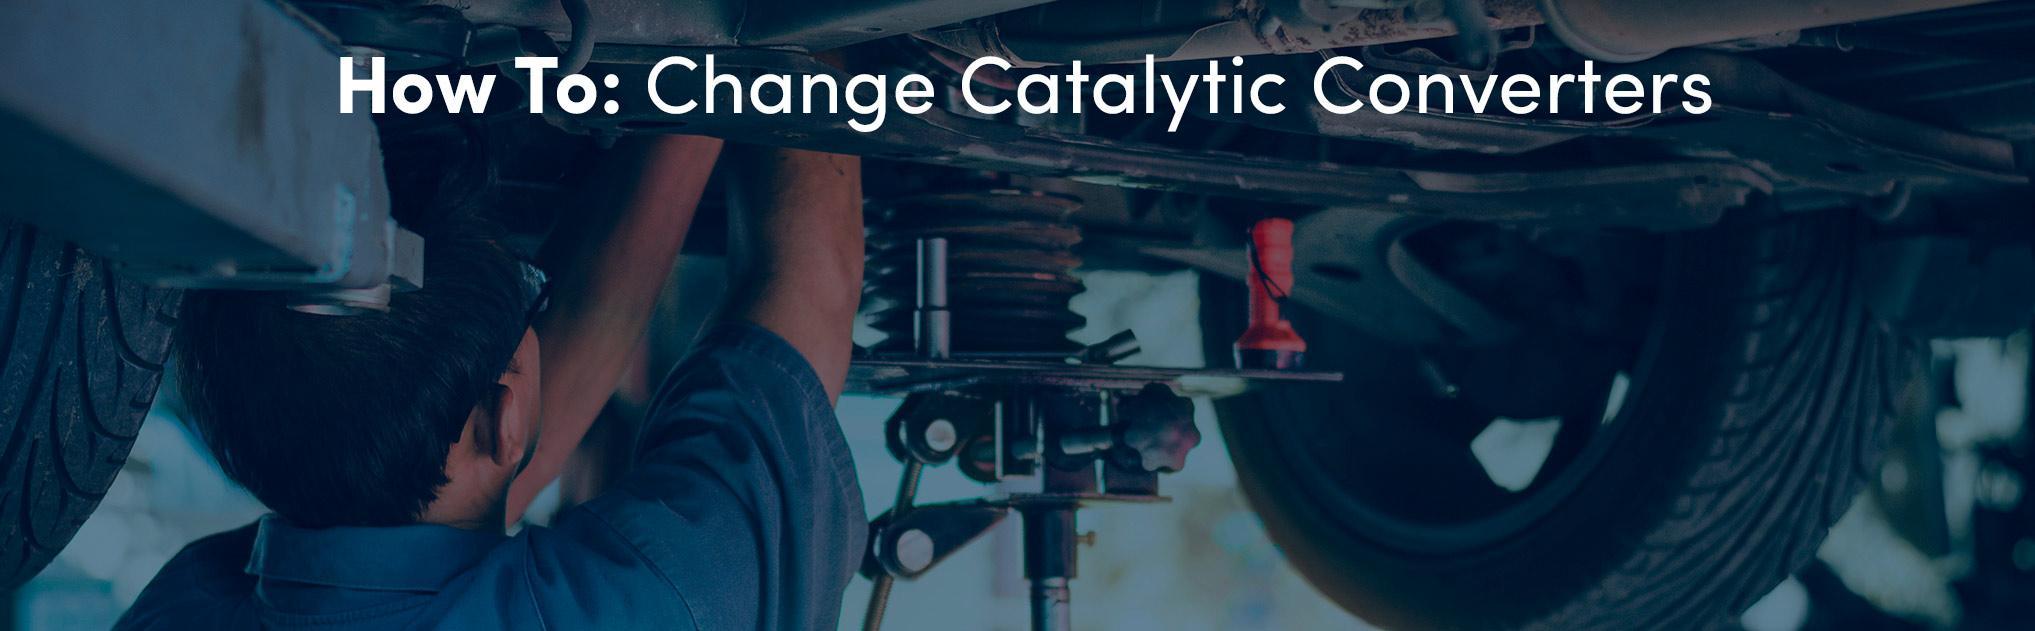 How To Change Catalytic Converter?